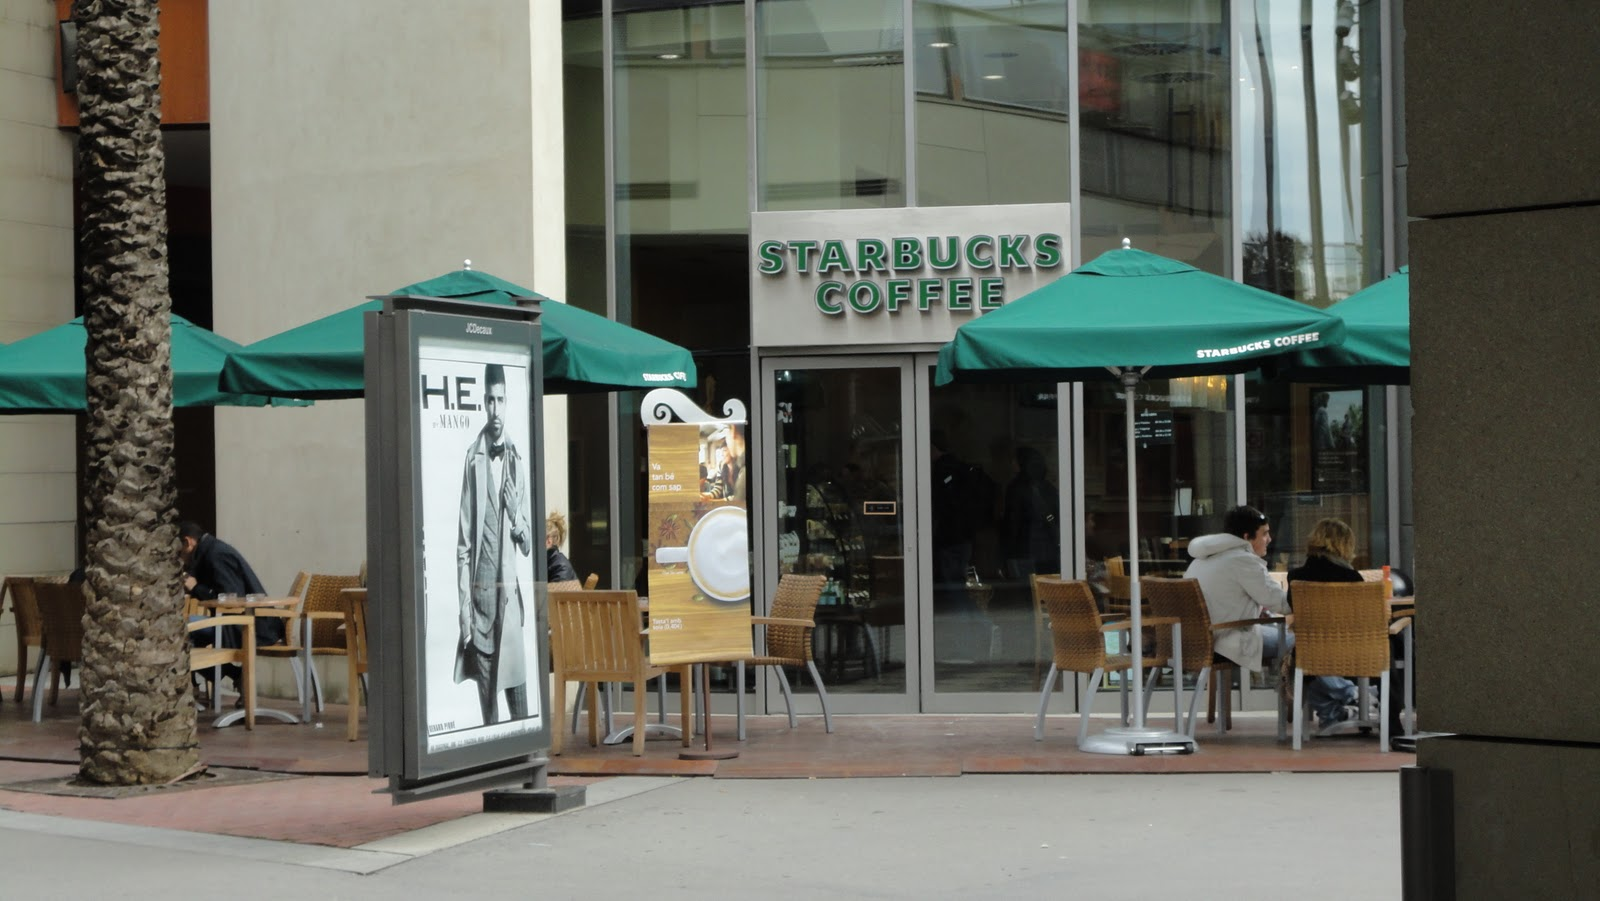 Mi starbucks coffee visitados - La maquinista barcelona ...